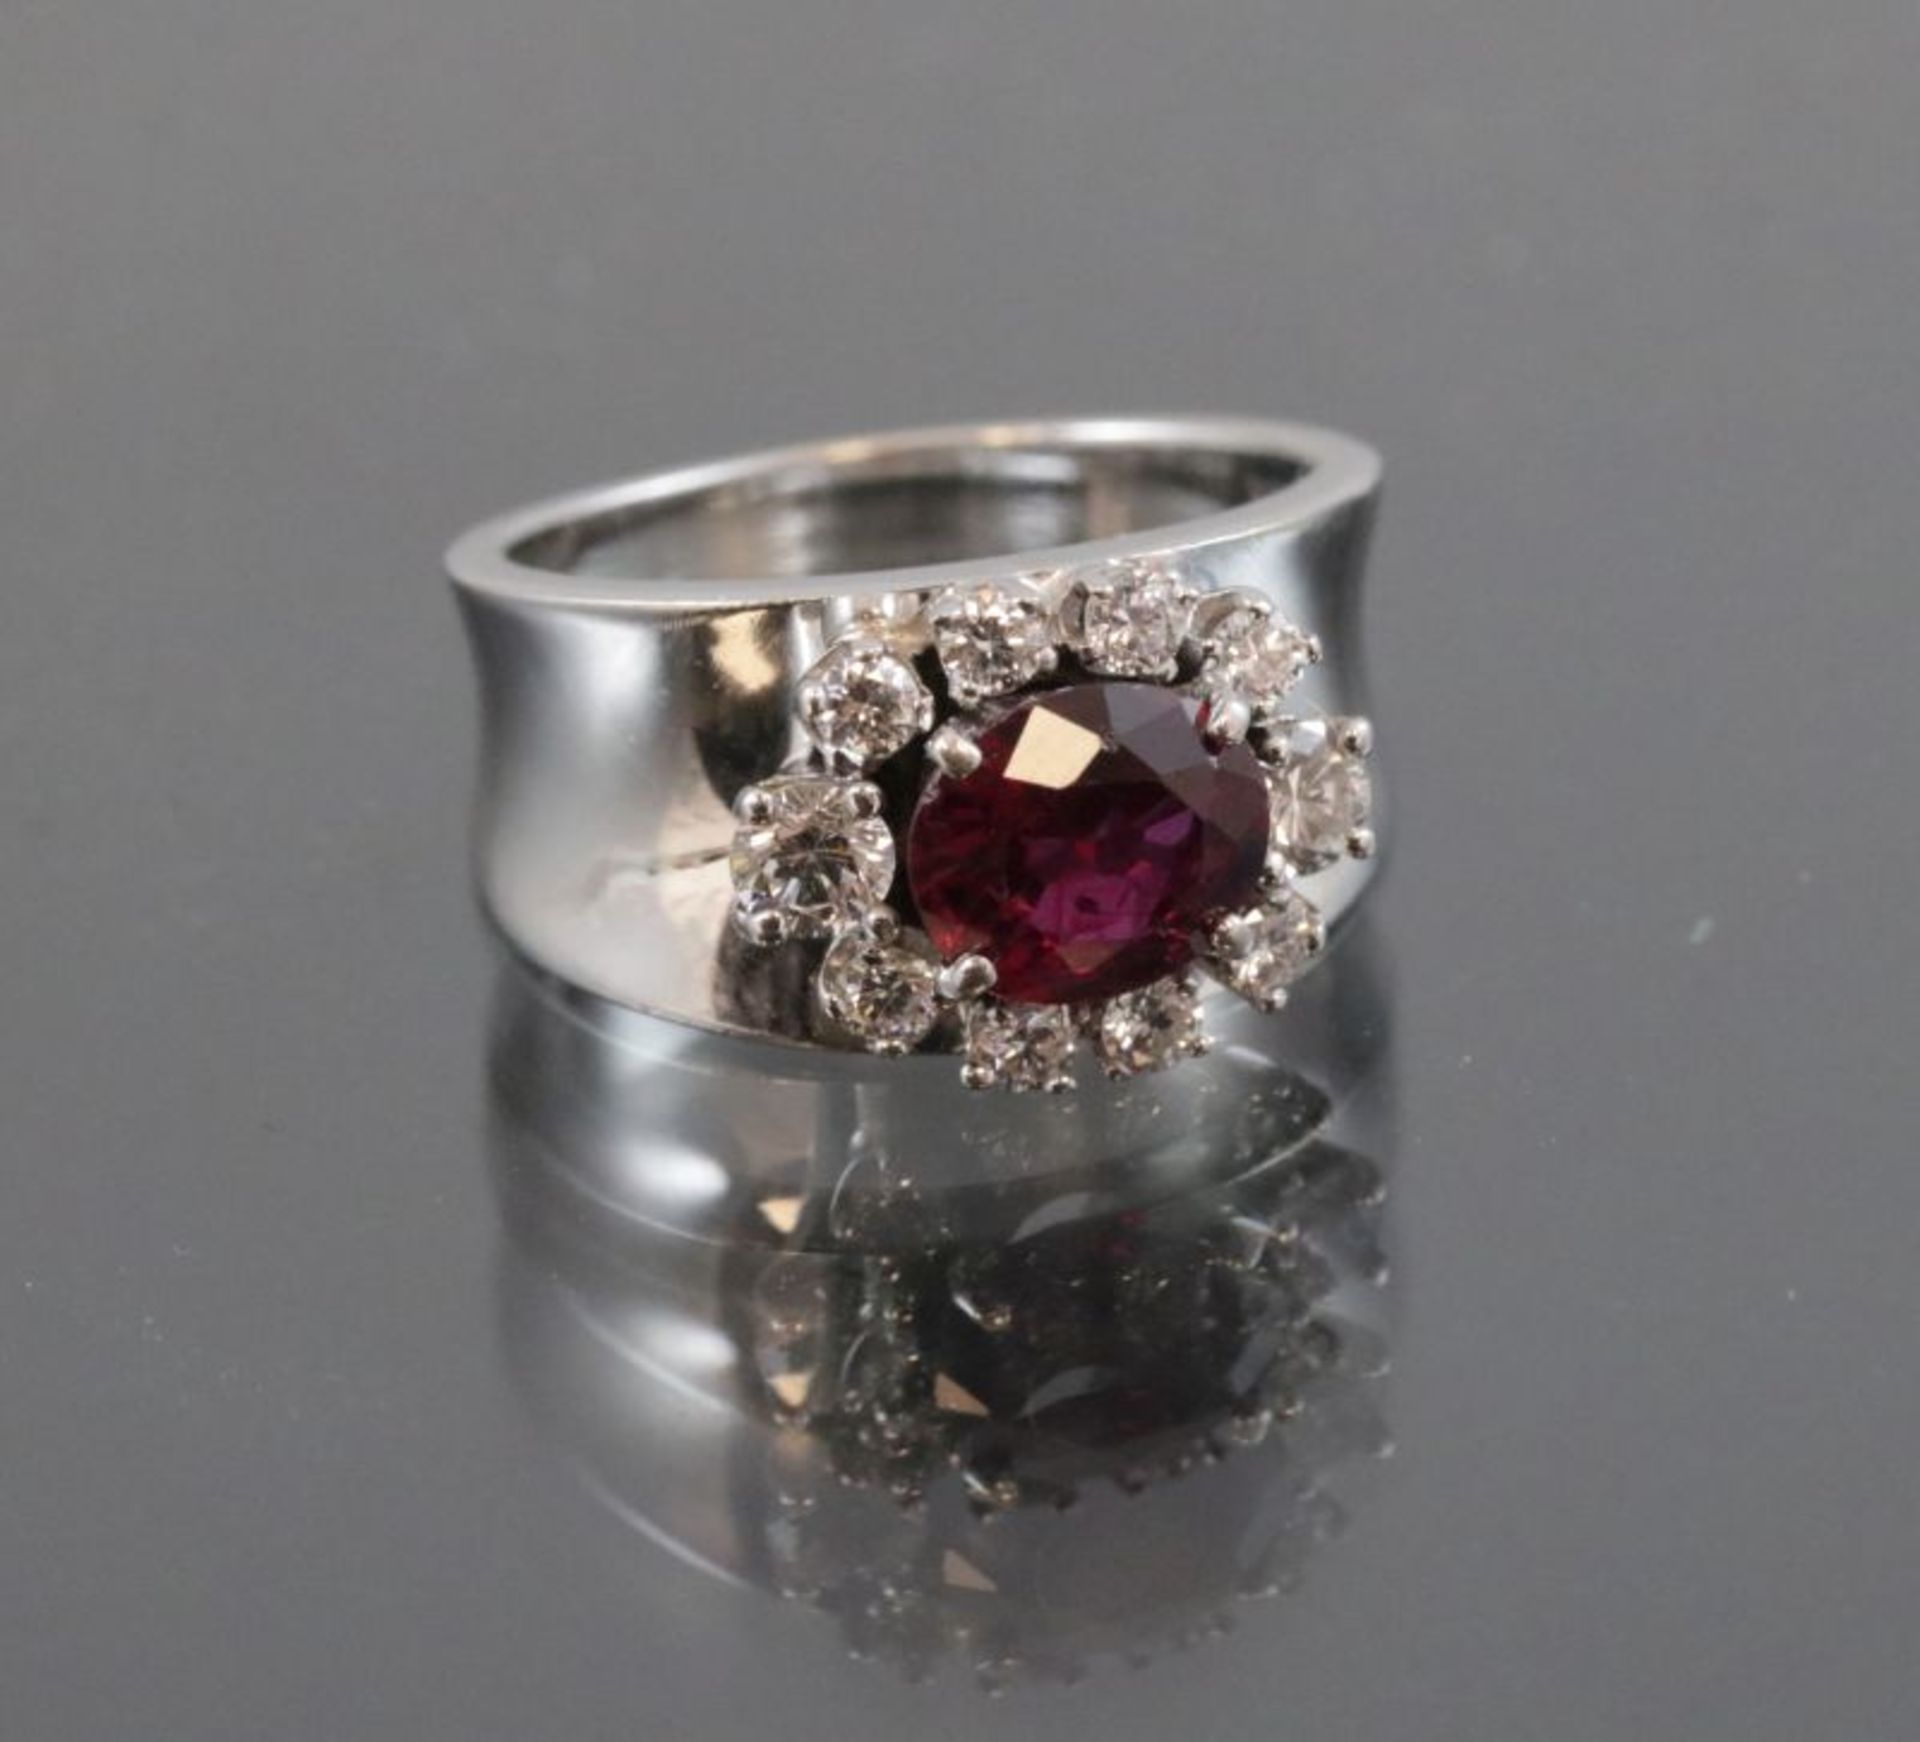 Los 53 - Rubin-Brillant-Ring, 750 Weißgold6,8 Gramm 10 Brillanten, 0,56 ct., Ringgröße: 48Rubin, ca. 1 ct.